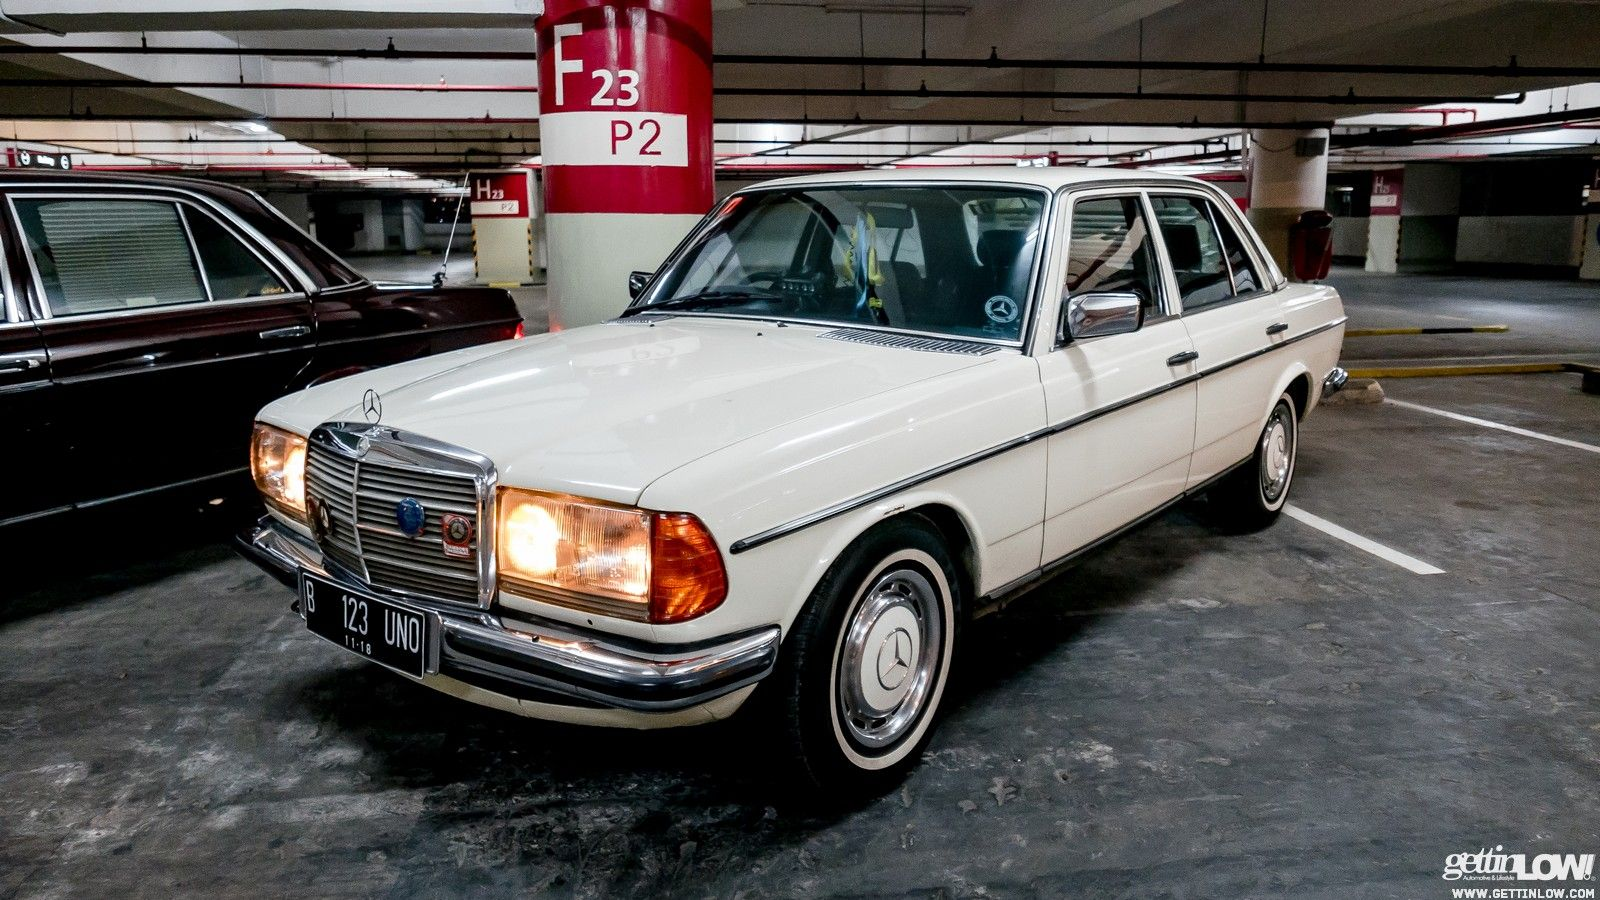 Mercedes Benz W123 Mercedes Benz Cars Mercedes W123 Mercedes